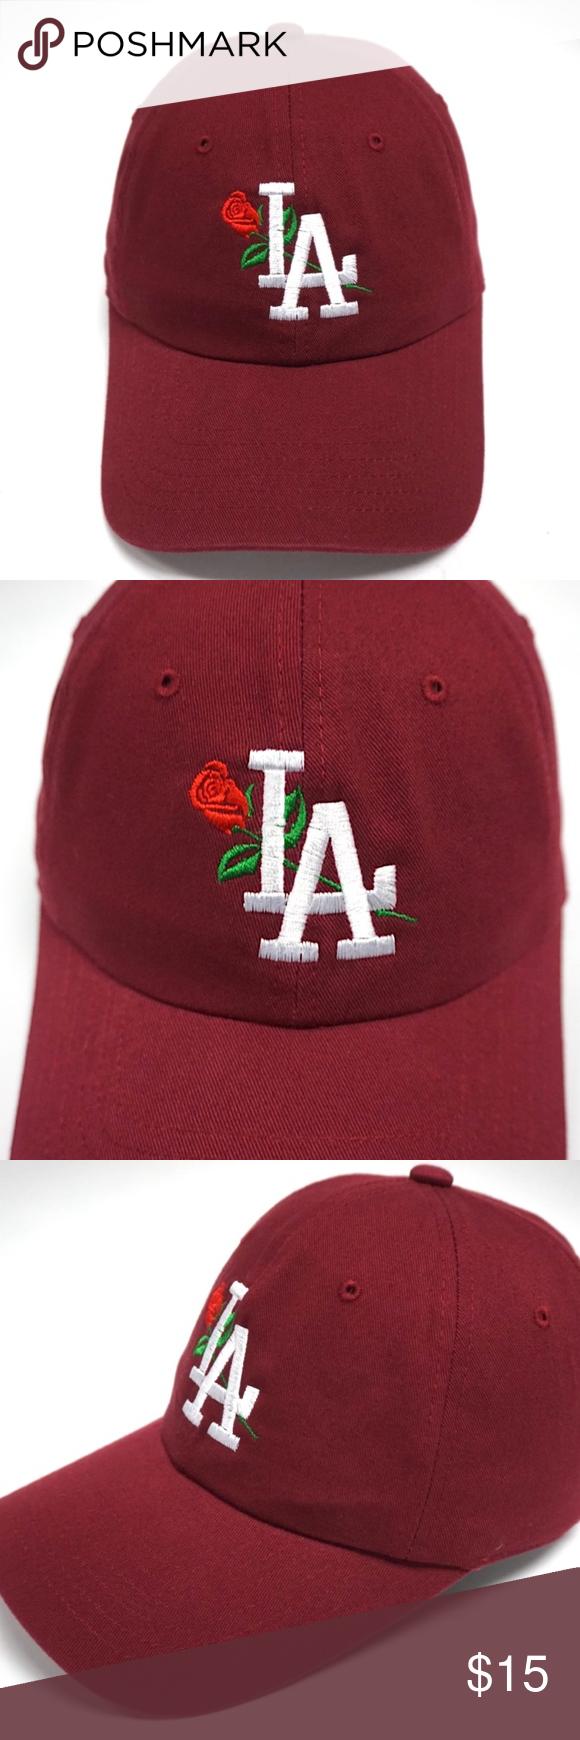 Los Angeles Dodgers Rose La Dad Hat Slouch Cap Dad Hats Women Shopping Fashion Trends